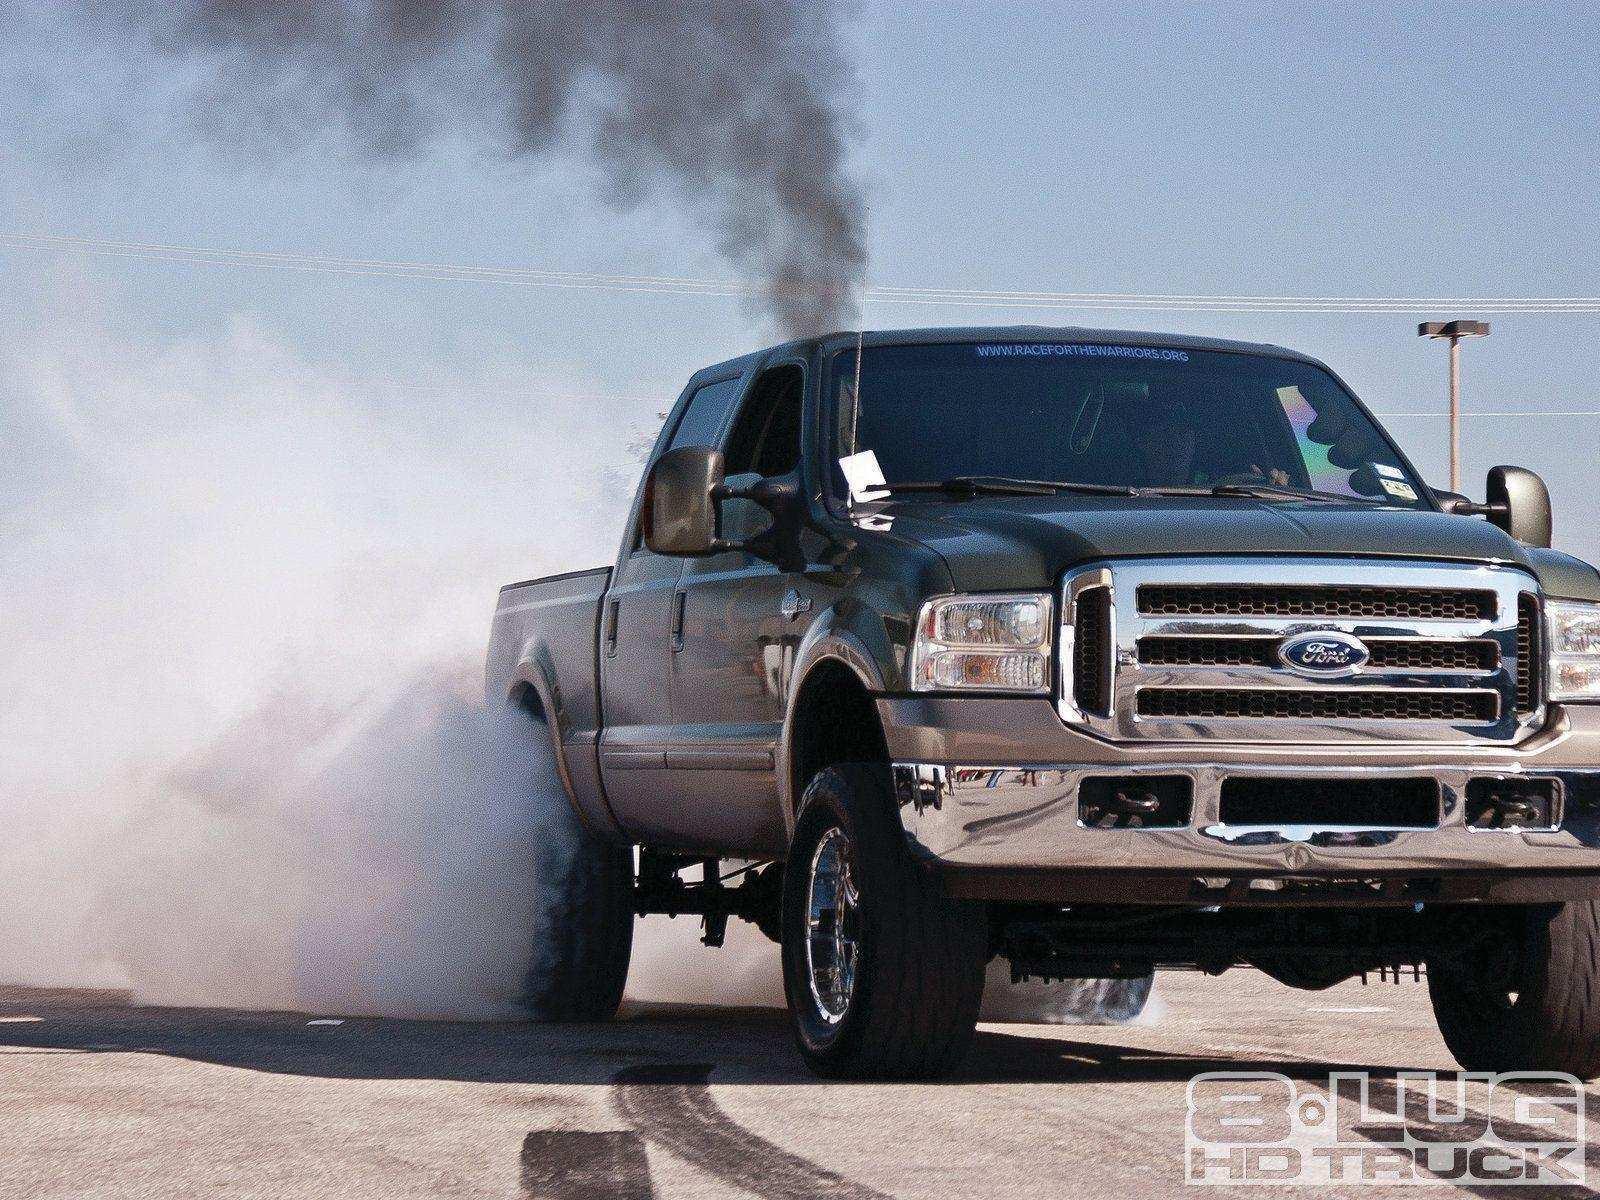 62 Gallery of Ford Diesel Wallpaper Release Date for Ford Diesel Wallpaper